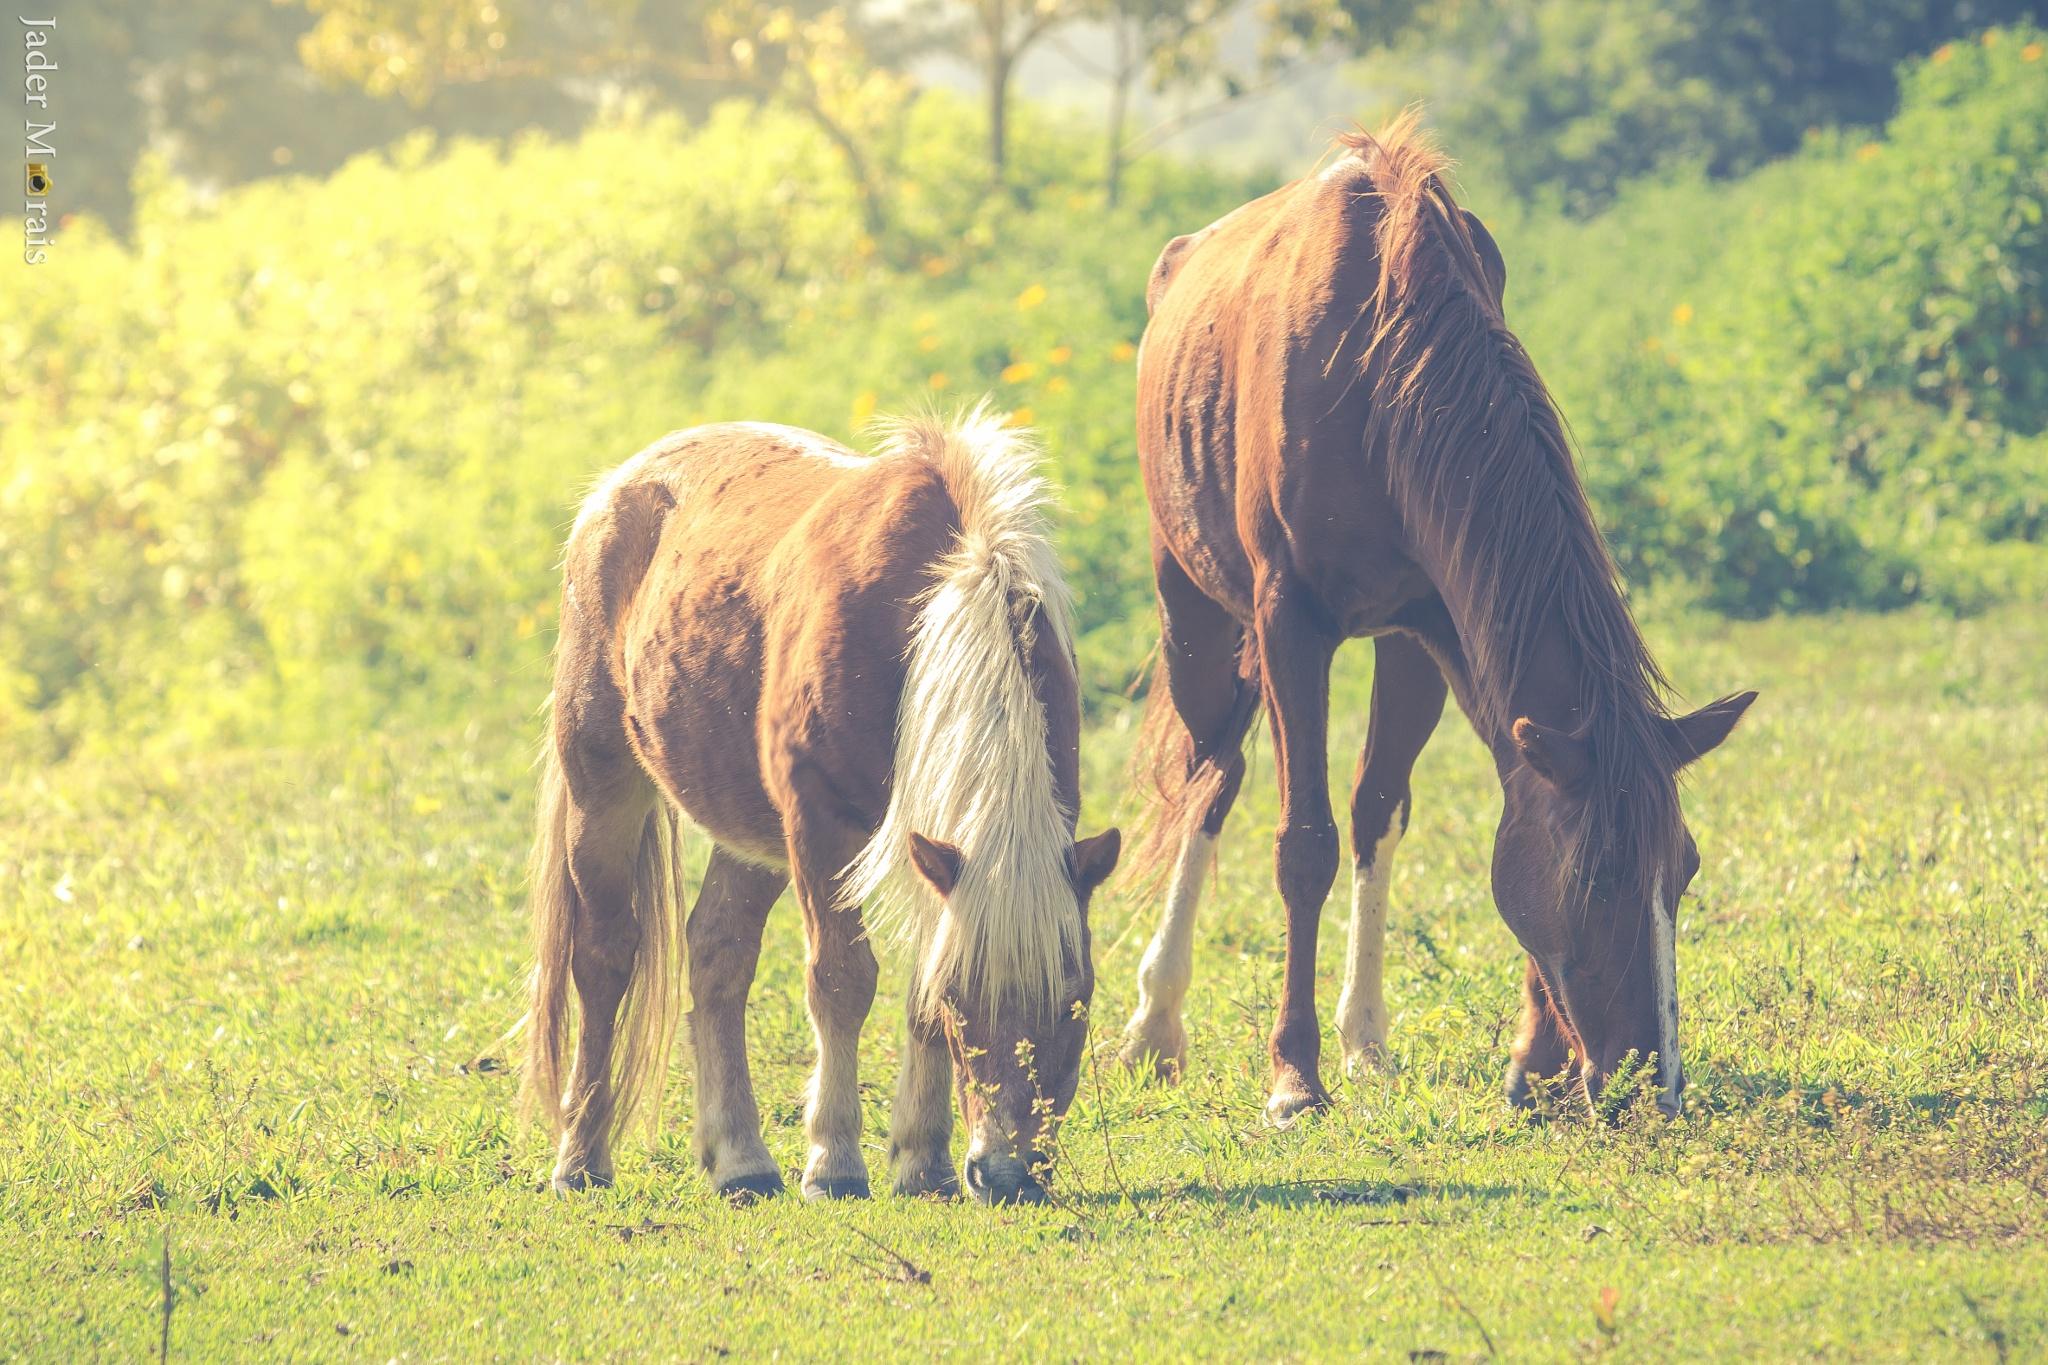 Horses by Jader Morais